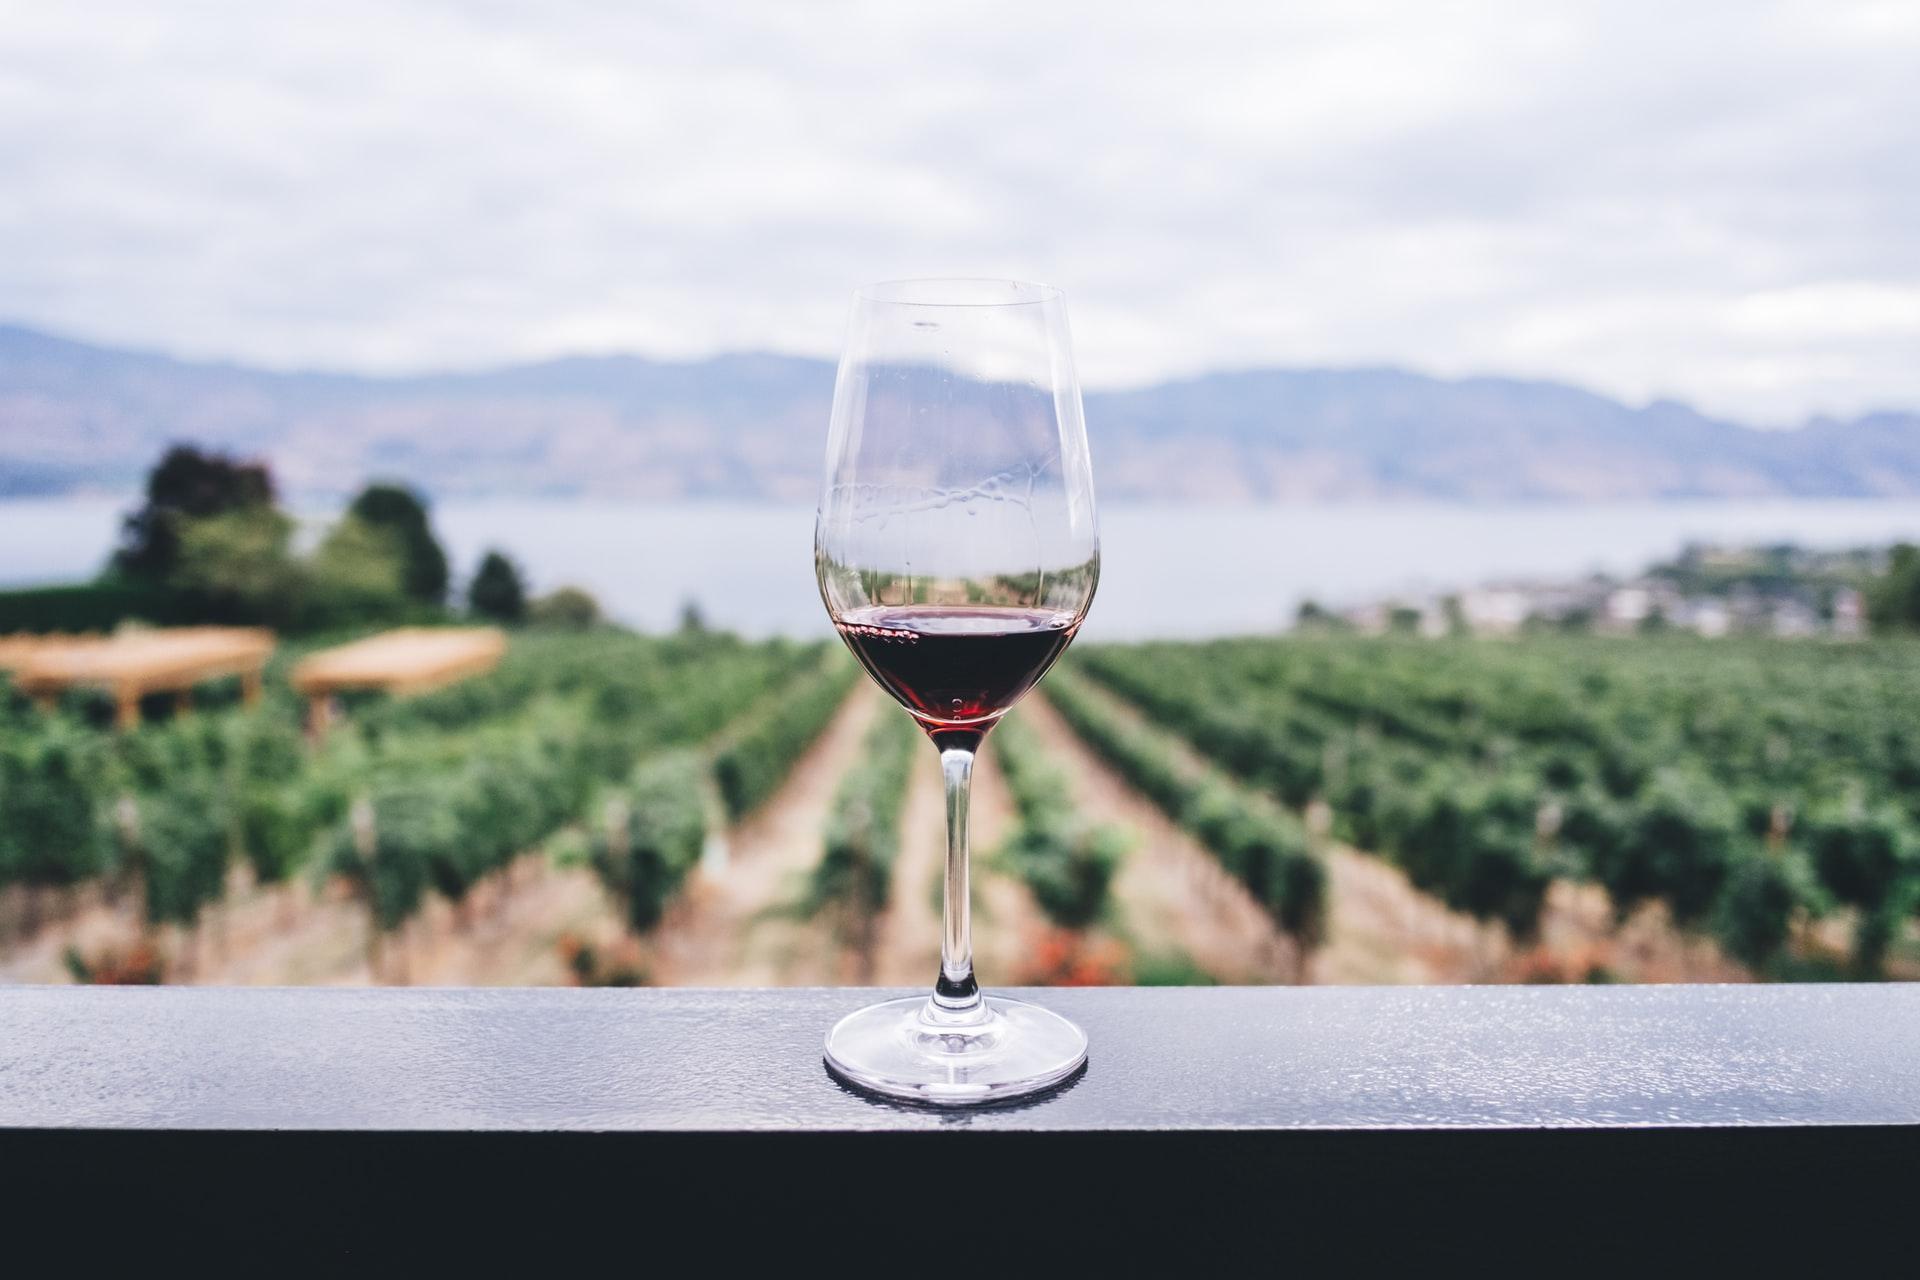 A wine glass overlooks a vineyard in Okanagen Valley, British Columbia